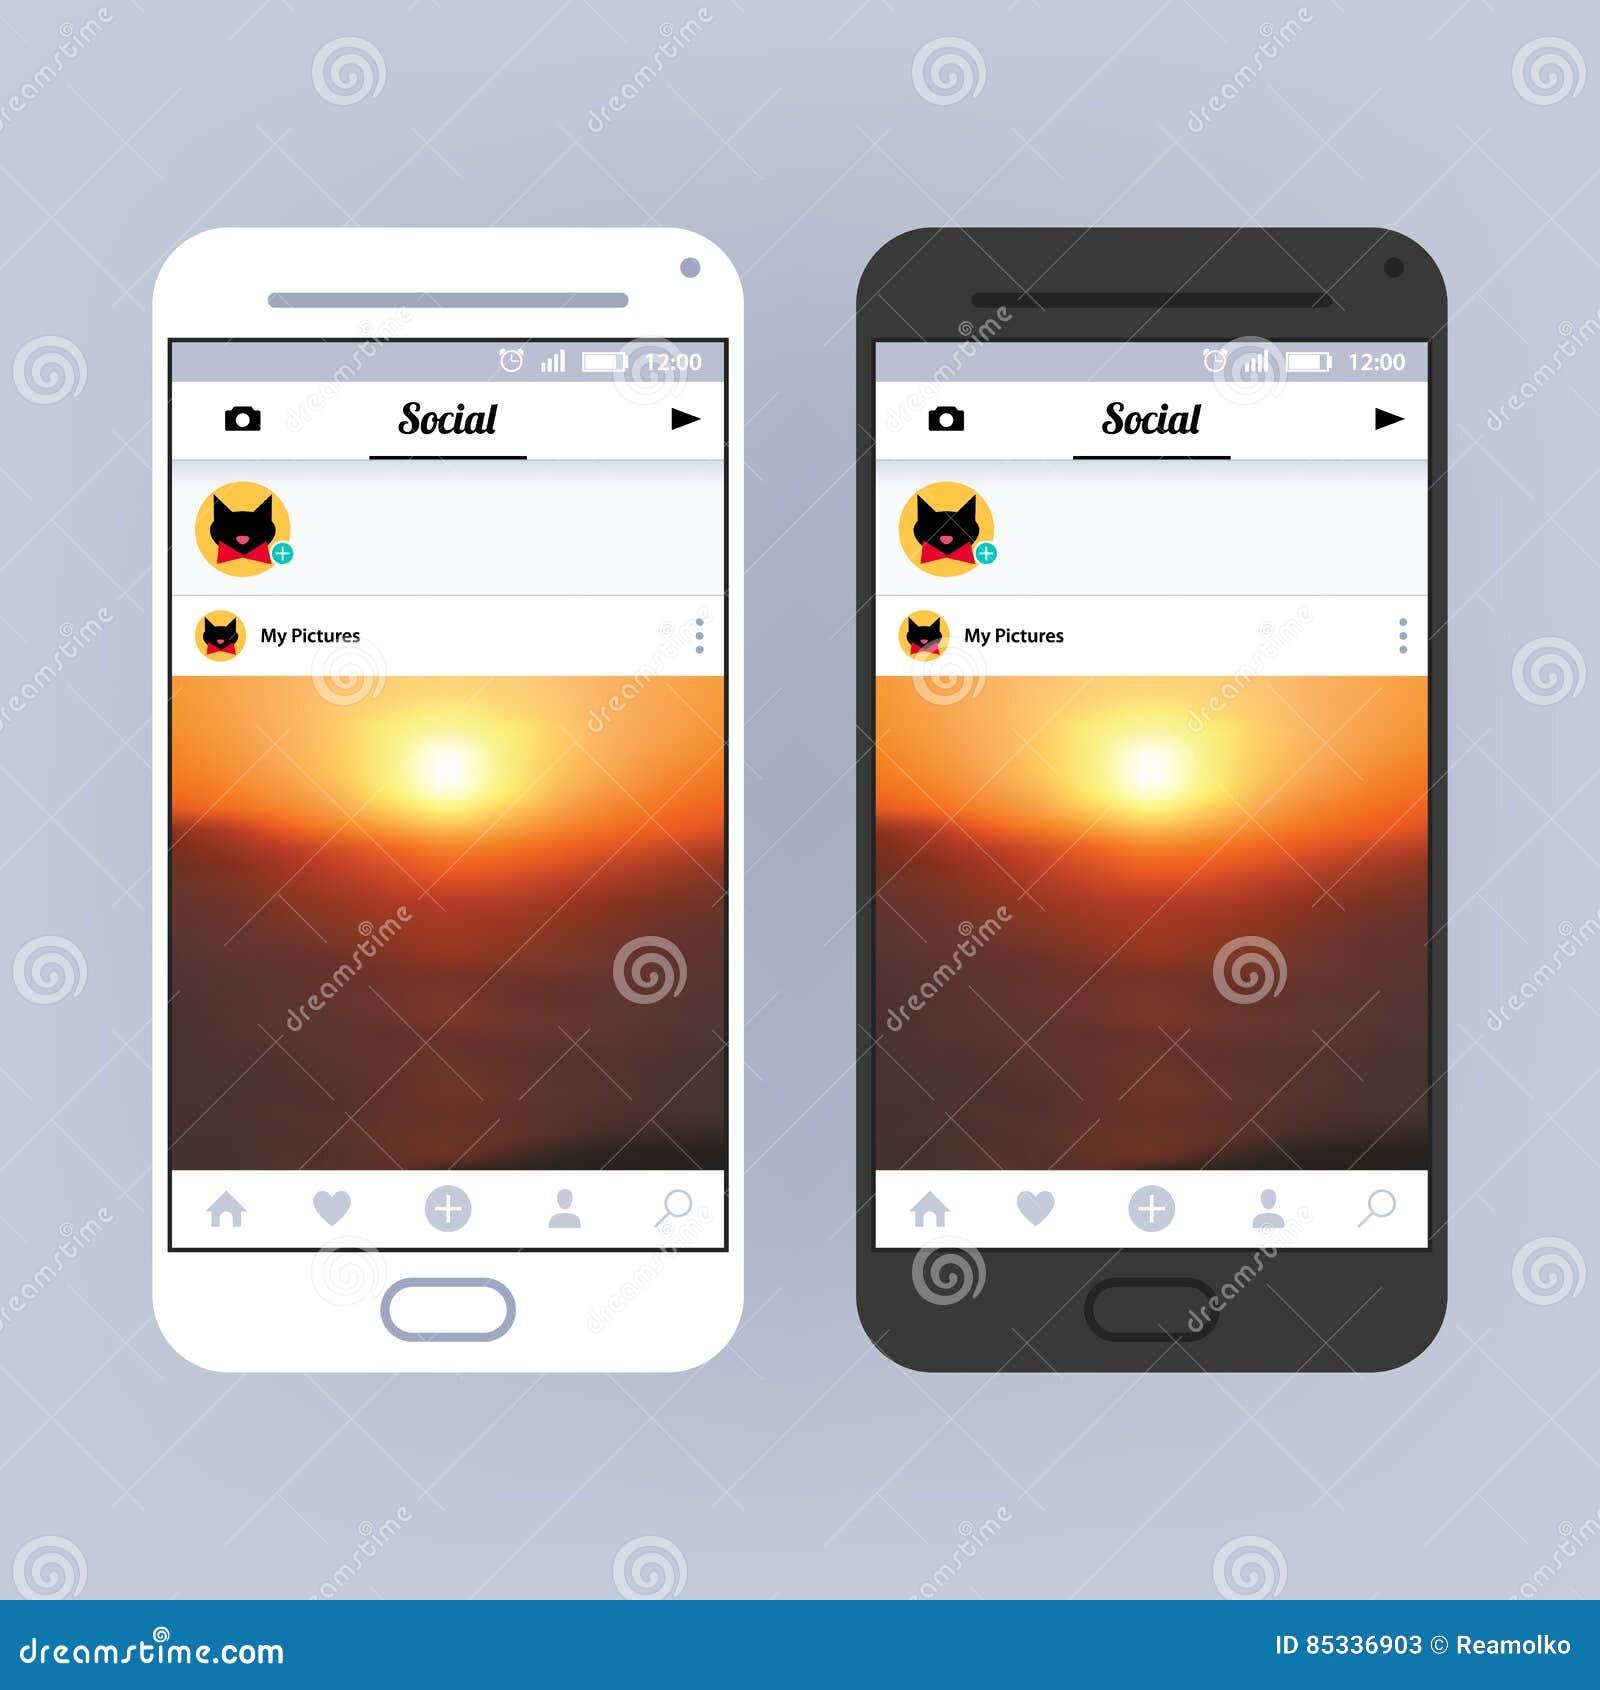 Social Network Frame. App Interface Design. Photo Sharing ...